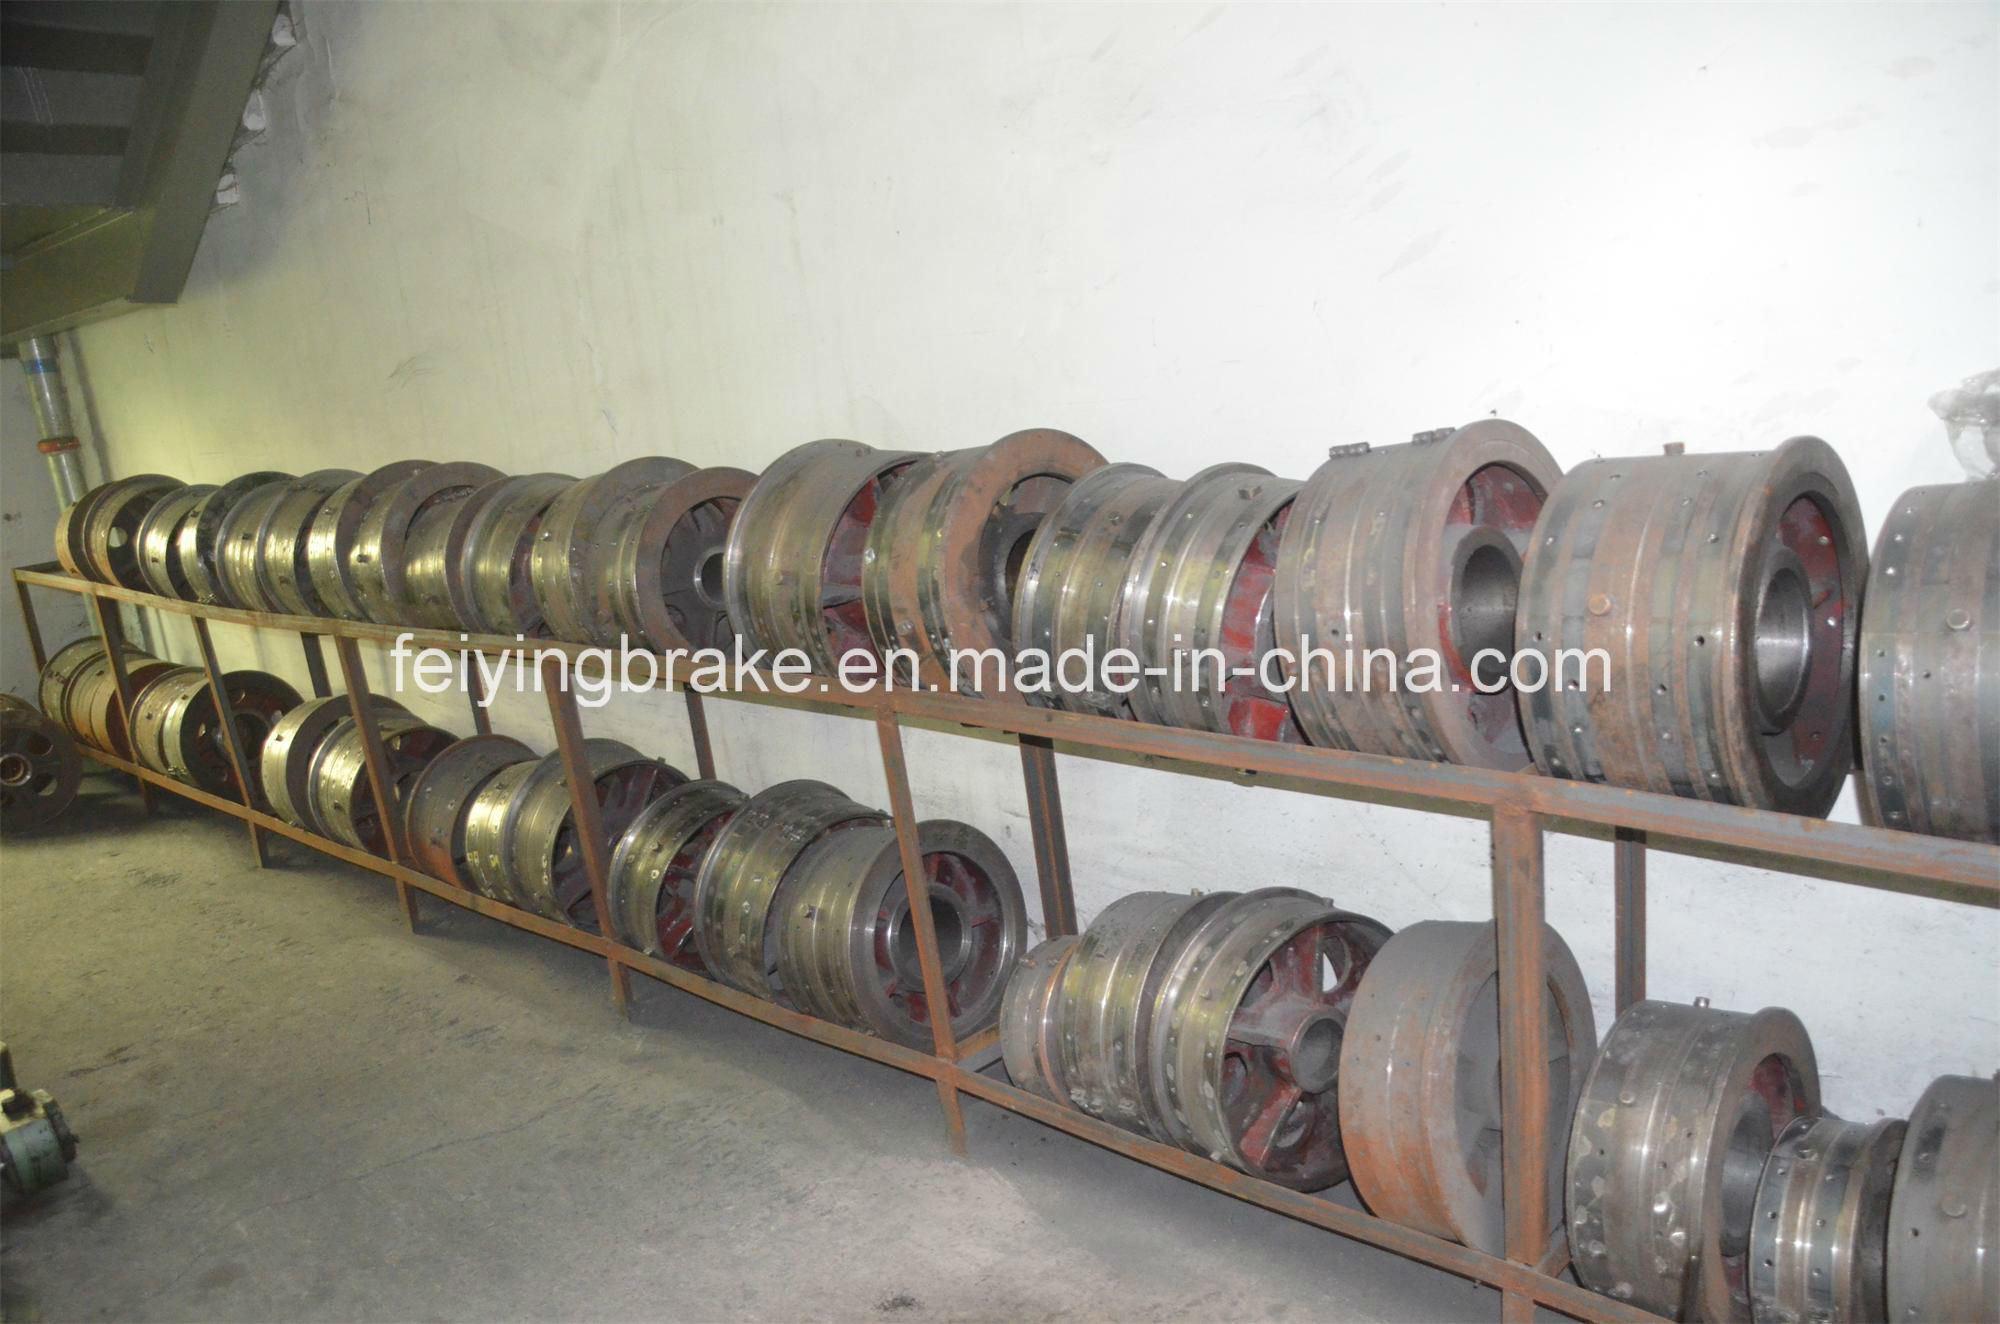 High Quality Brake Lining (WVA: 19496 BFMC: MP/36/2)